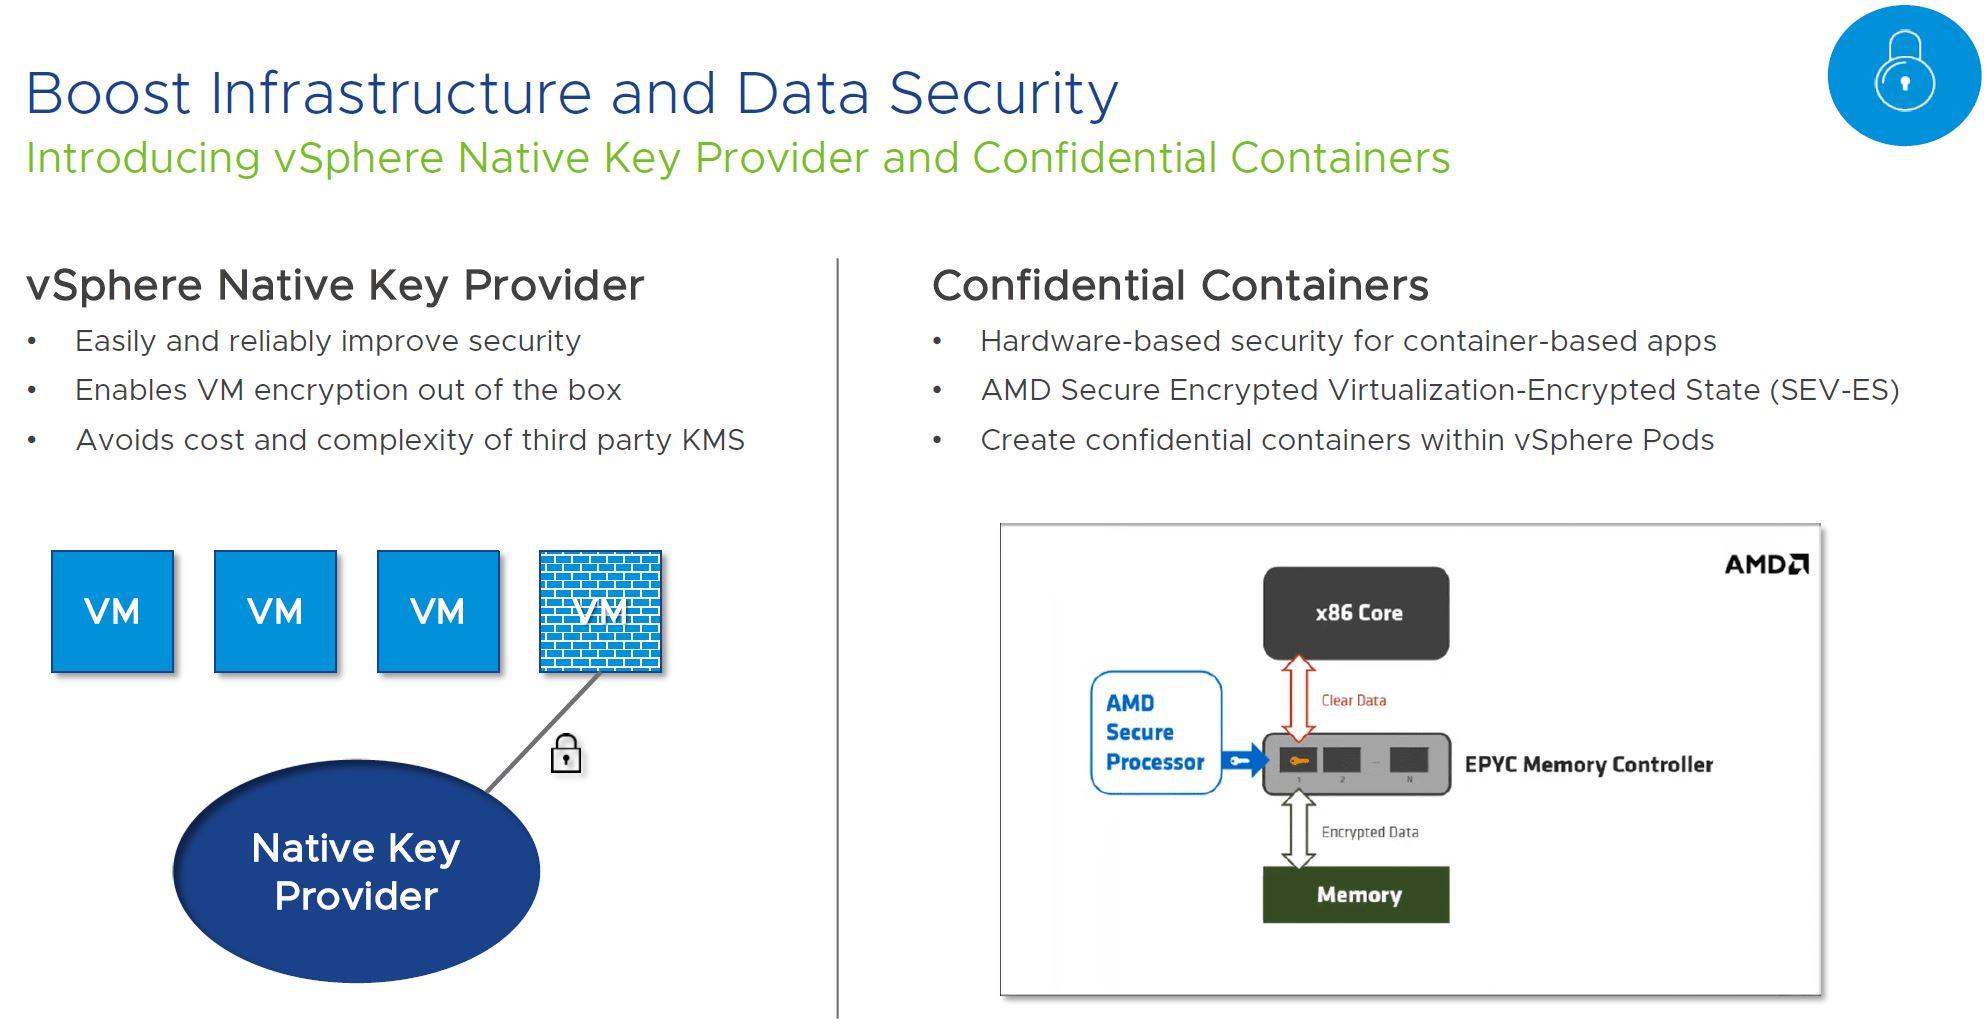 VMware VSphere Confidential Containers